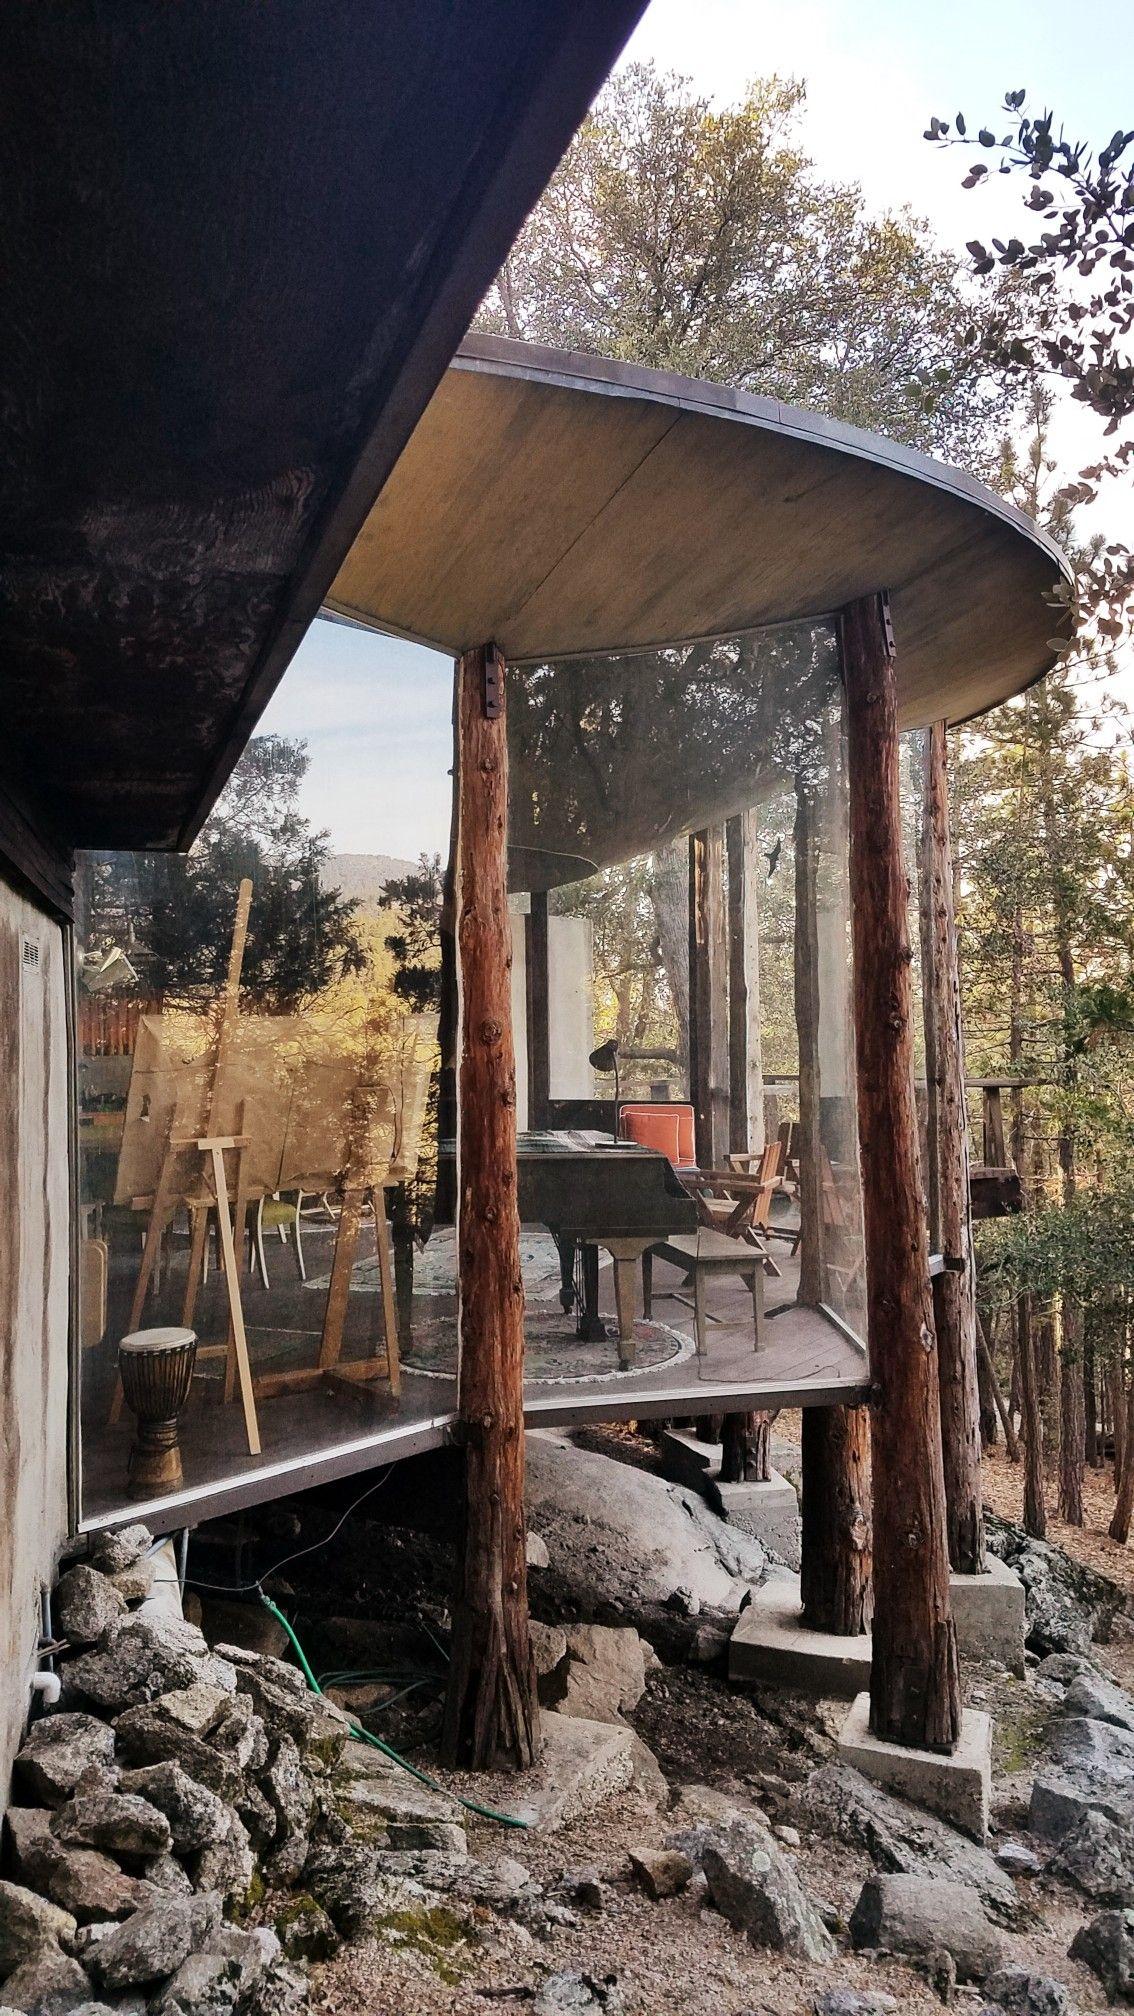 Pearlman Cabin, 1957 Idyllwild, CA